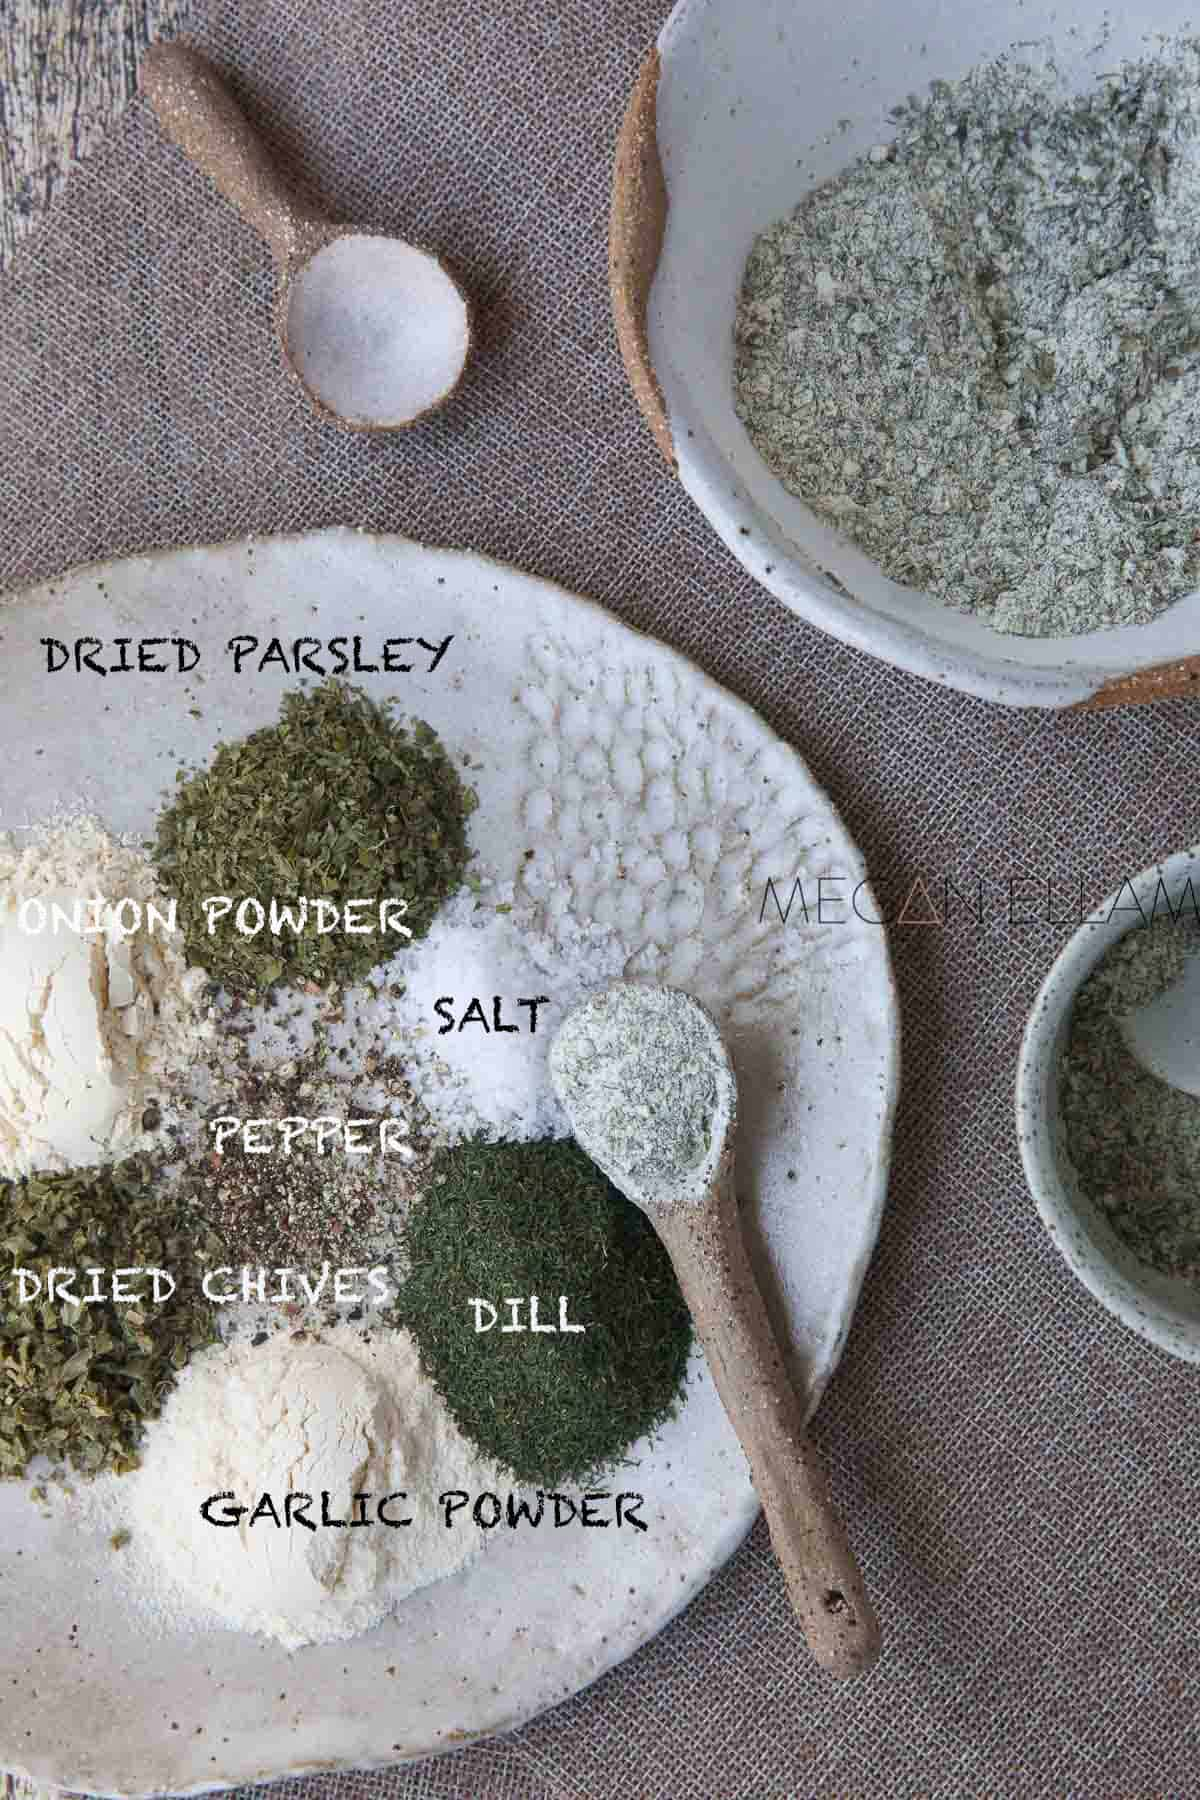 Keto Ranch Seasoning ingredients on a plate.